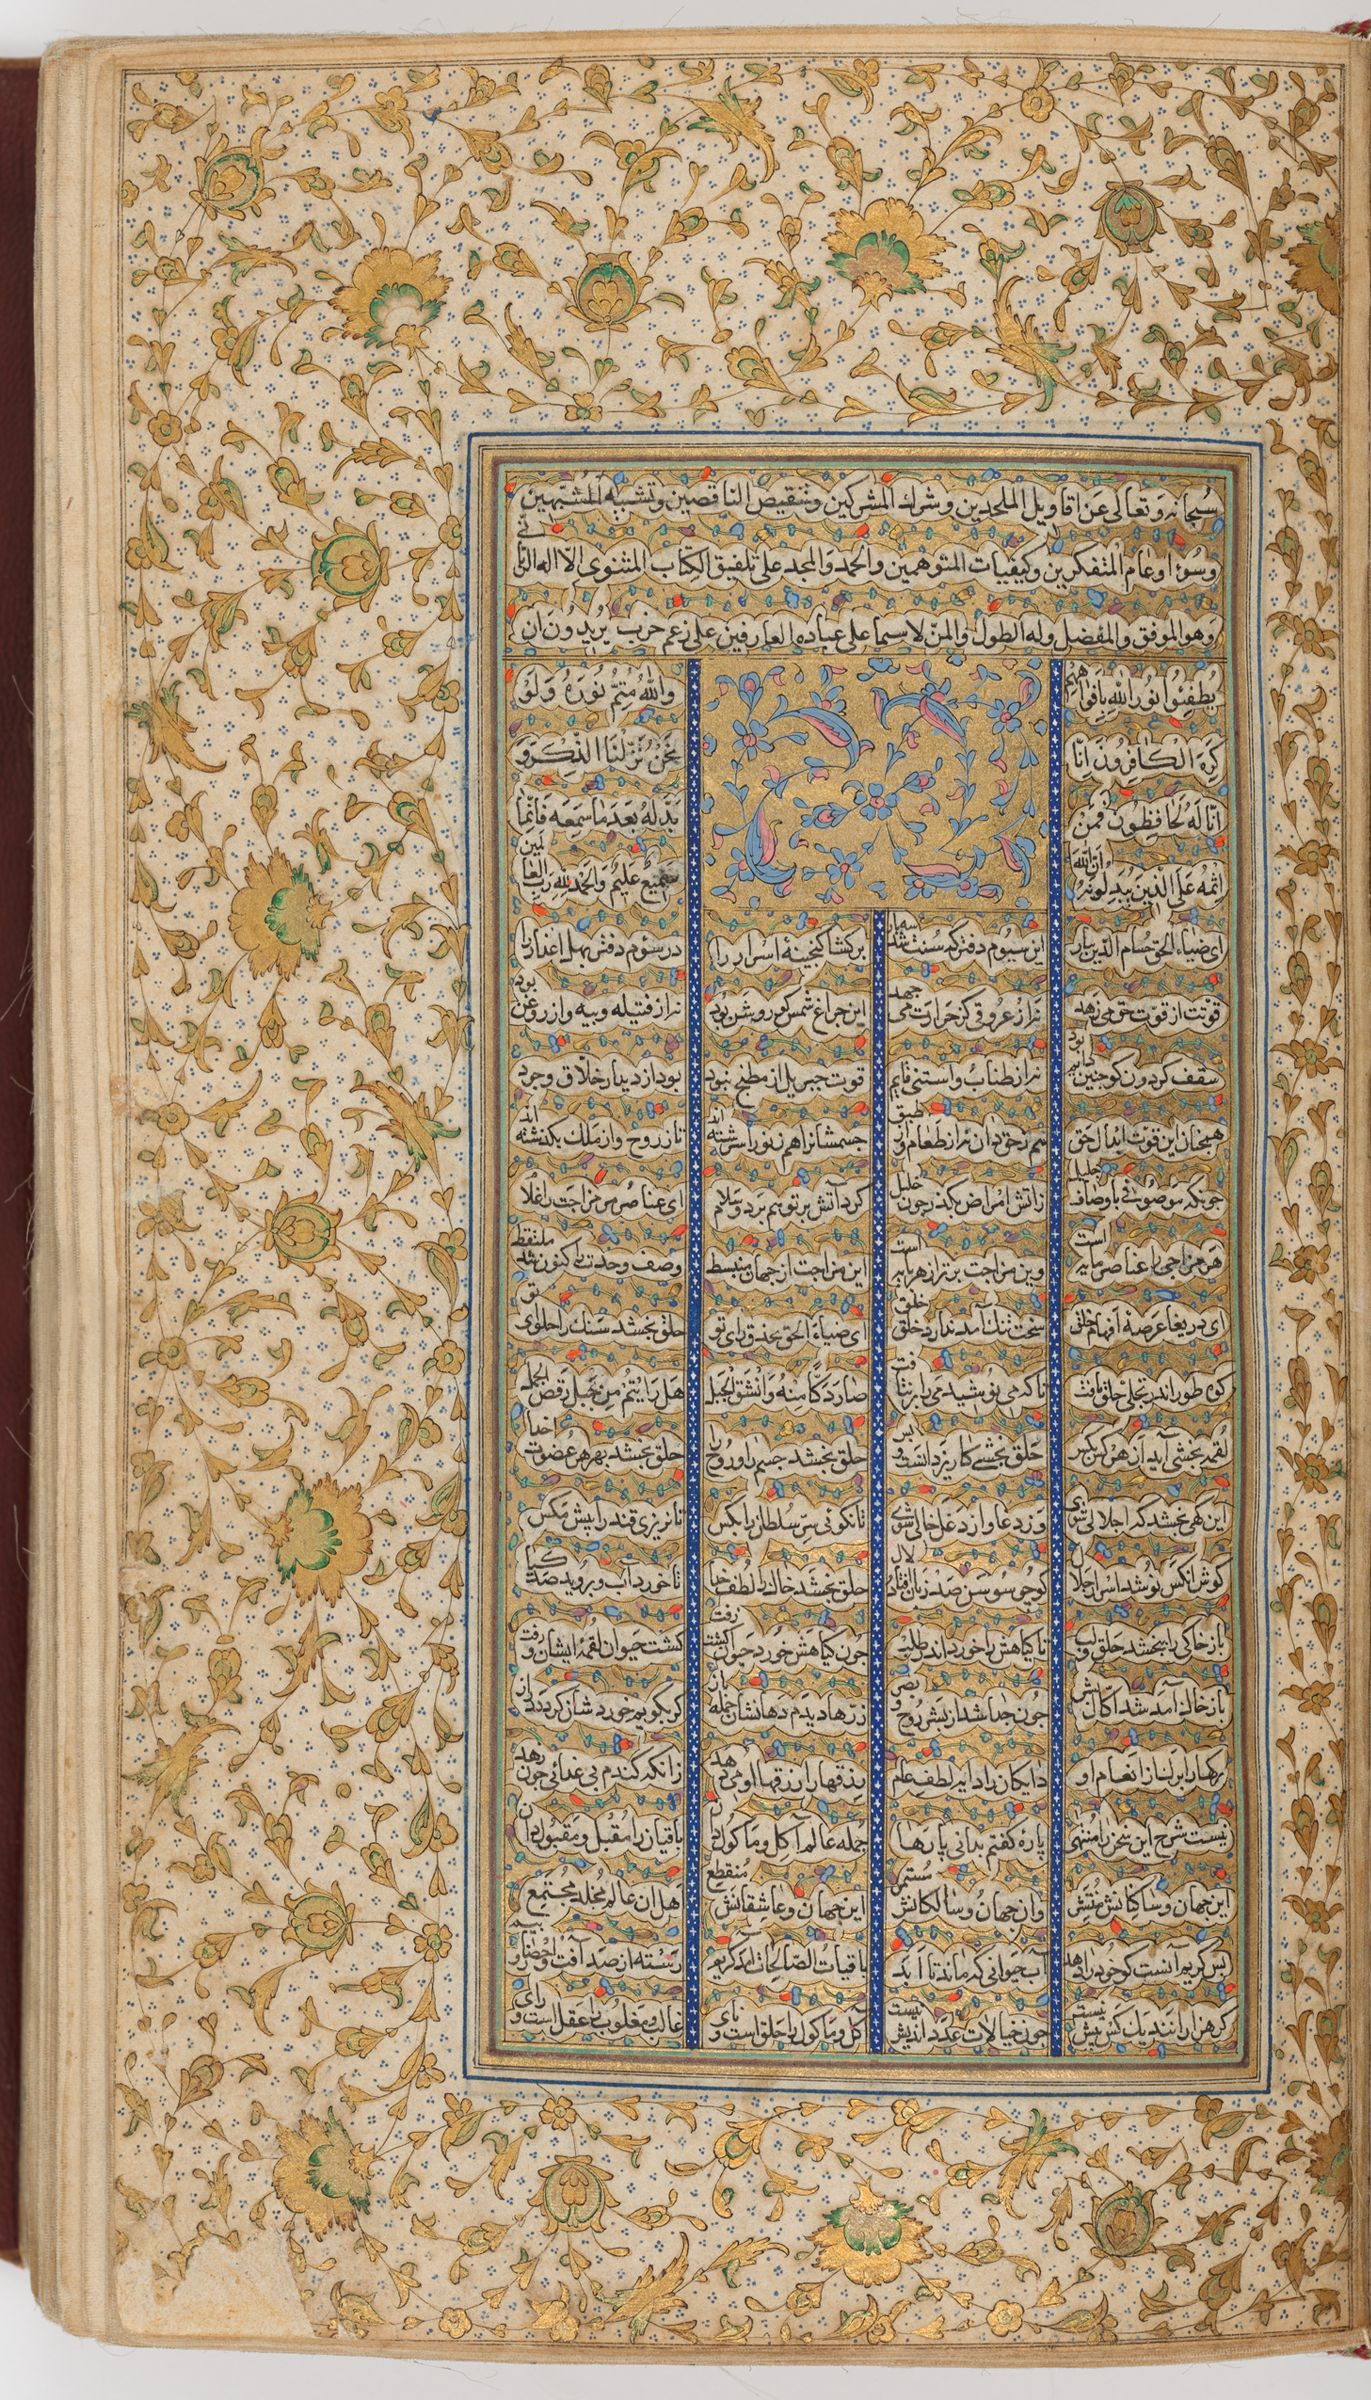 Illuminated Margin And Interlinear Gilt Text (Illumination And Gilt Recto; Text Verso Of Folio 91), Folio From A Manuscript Of The Mathnavi Ma'navi By Maulana Jalal Al-Din Rumi